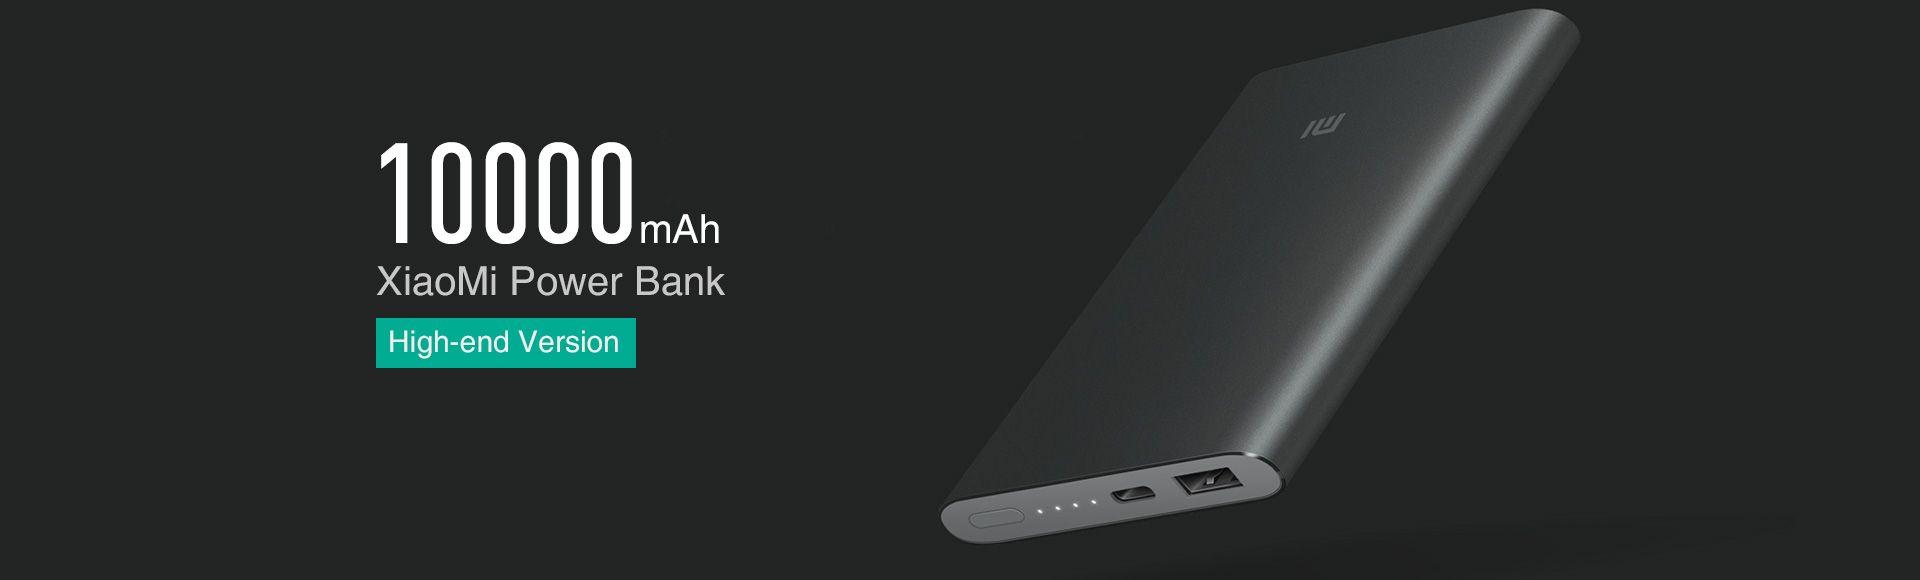 Xiaomi Mi Power Bank 10000mAh Type-C Black